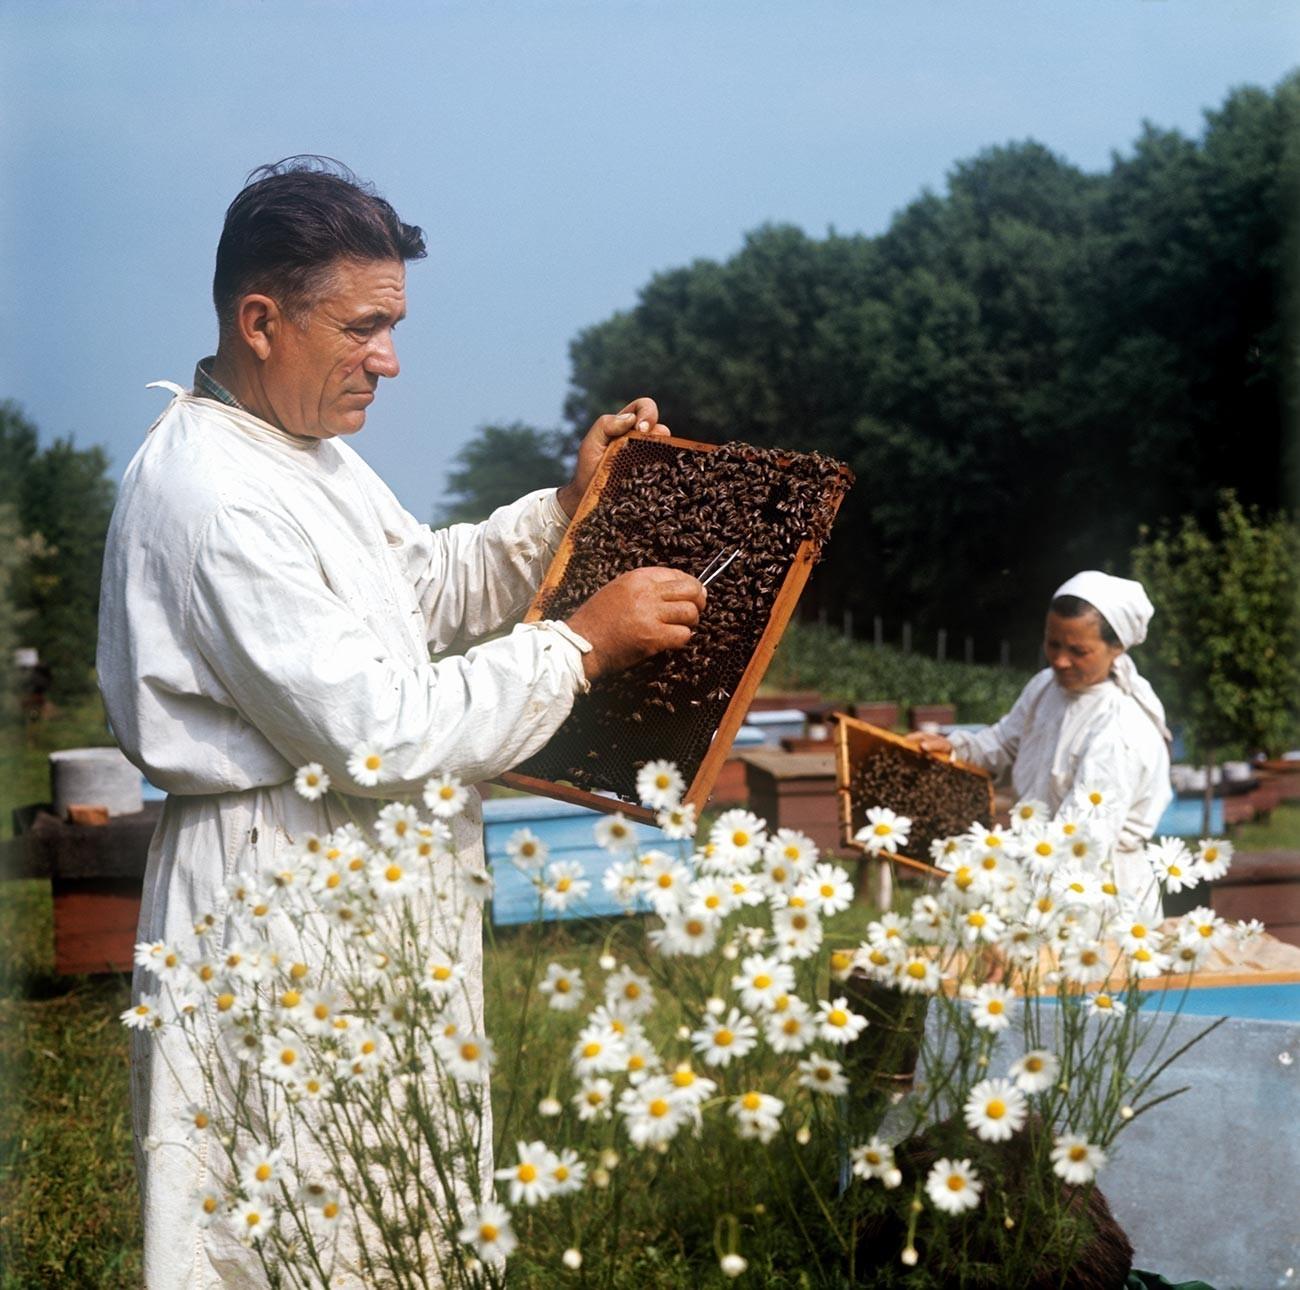 Čebelar Anton Lupulčuk pri čebelnjaku na kolhozu Majak v Dondjušanskem okraju, Moldavska SSR, 1975